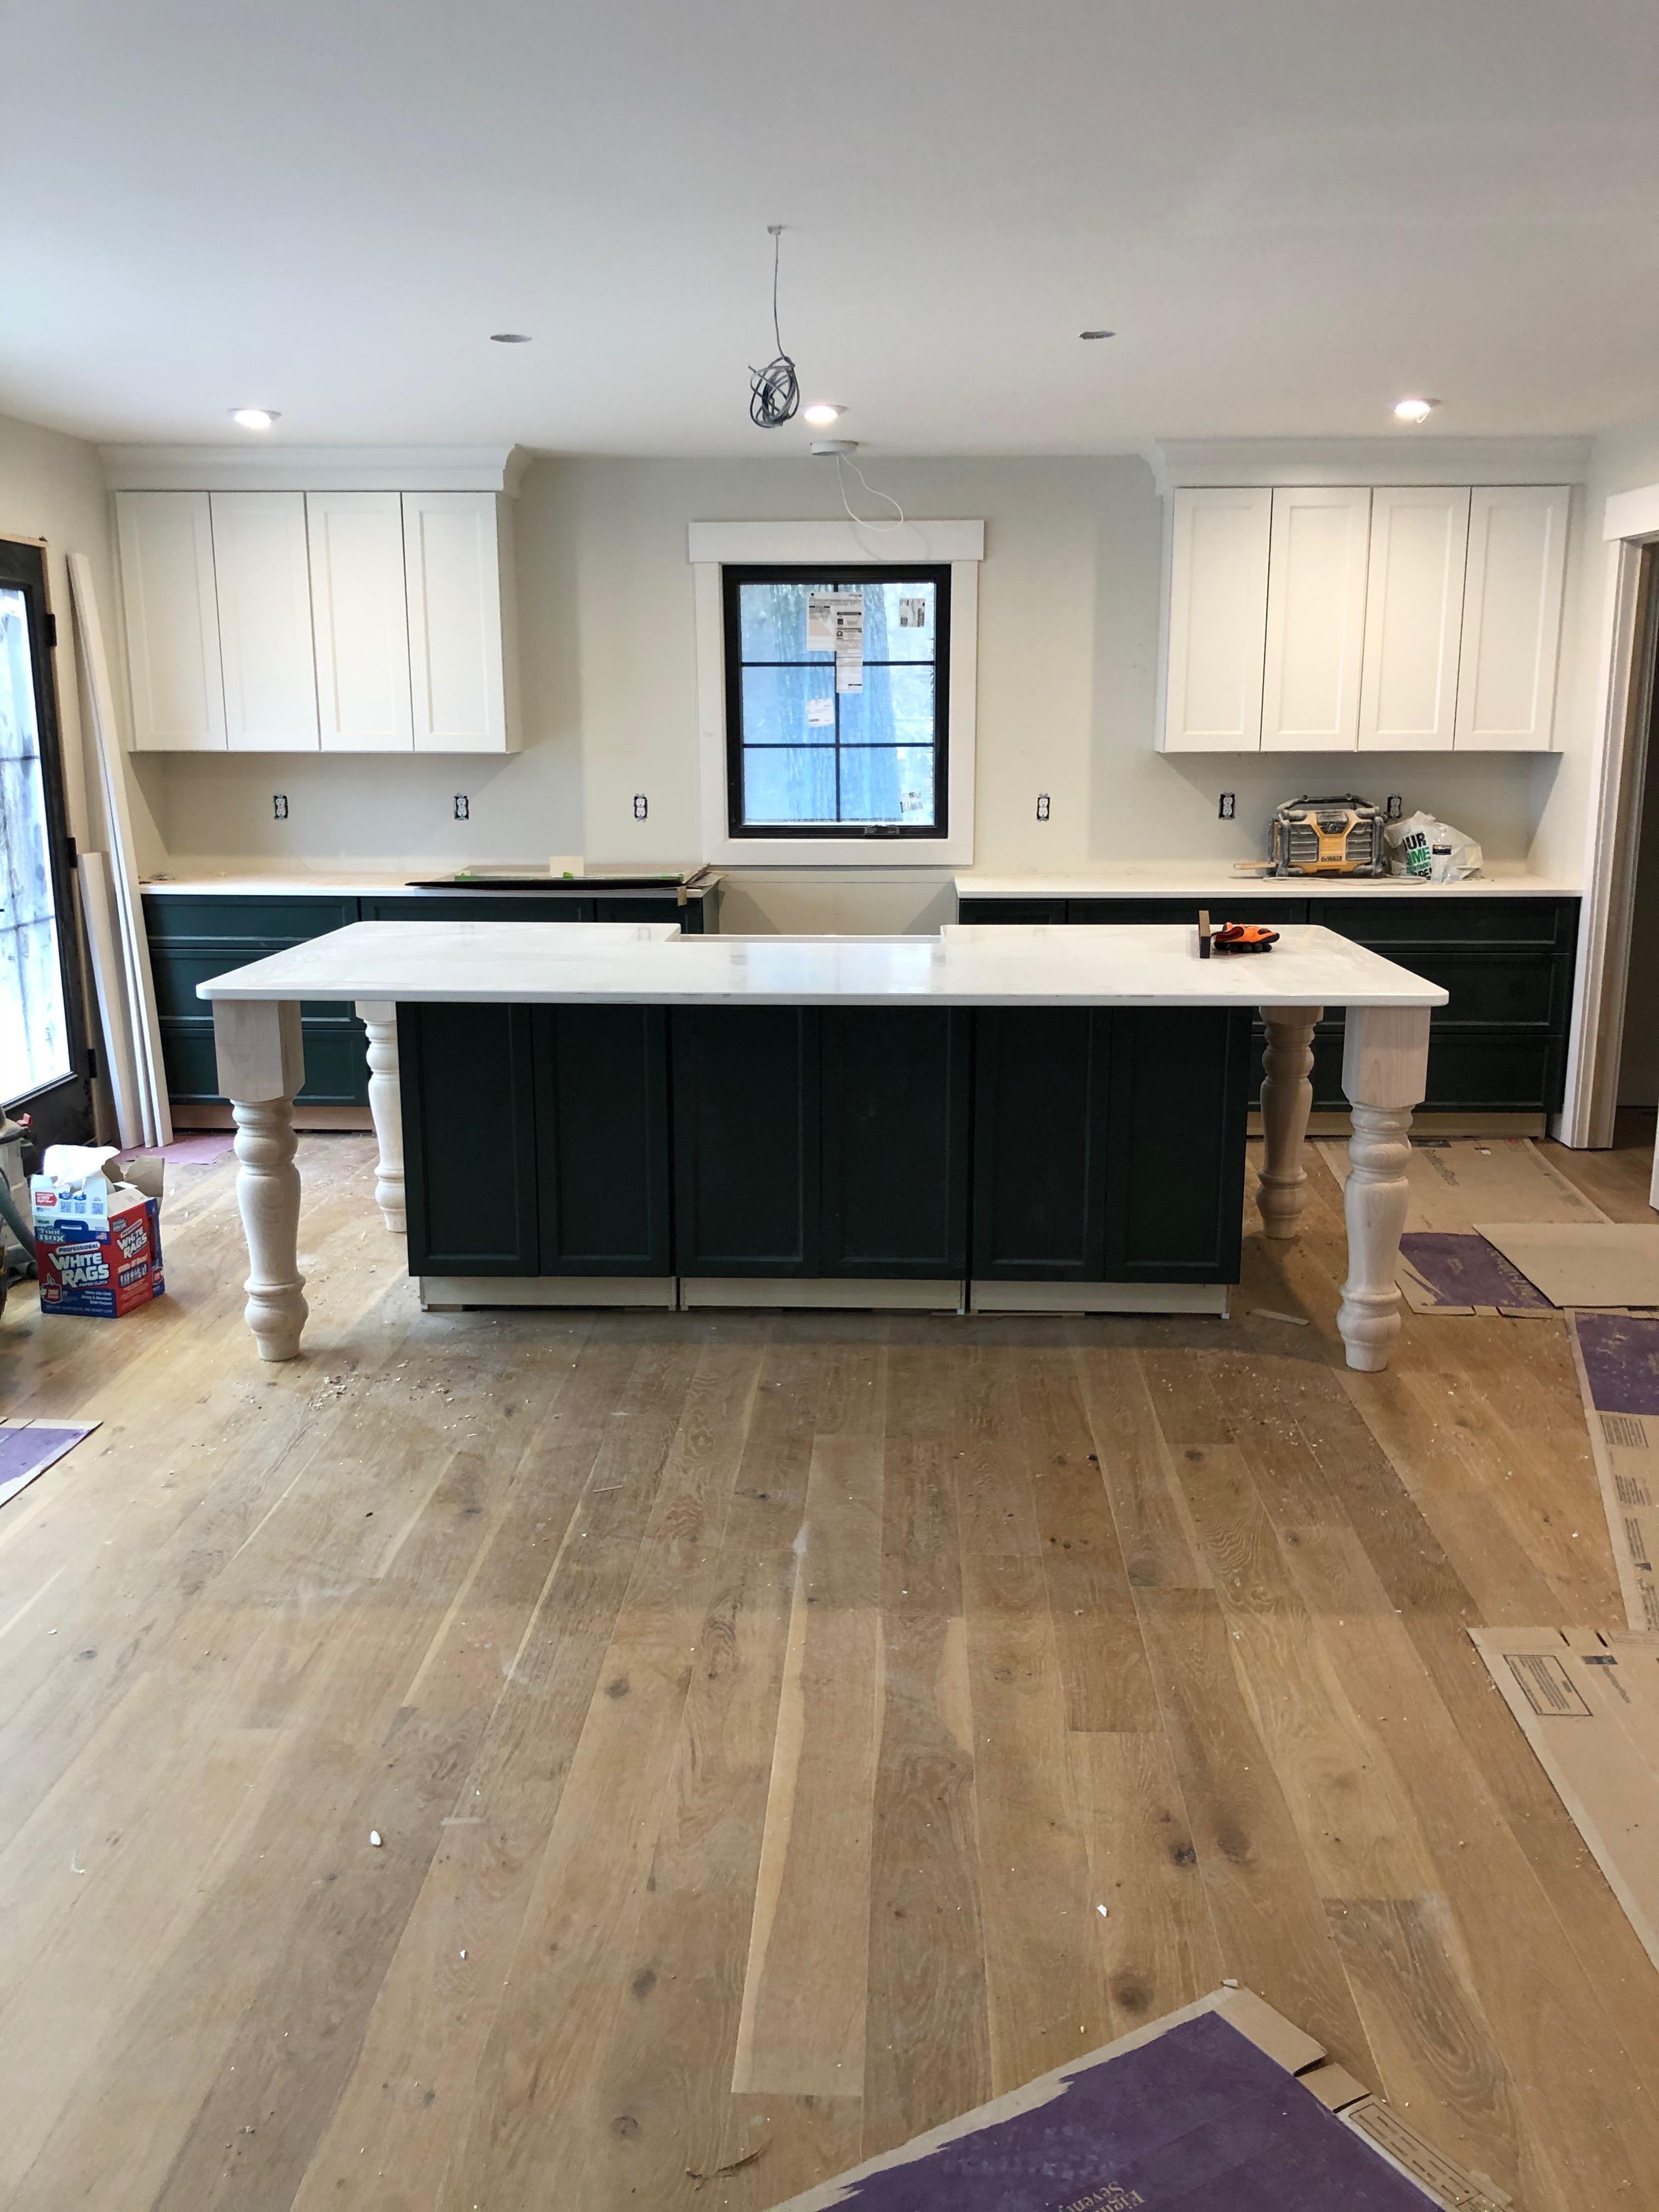 Elevation kitchen under construction at 2019 Laurence Court